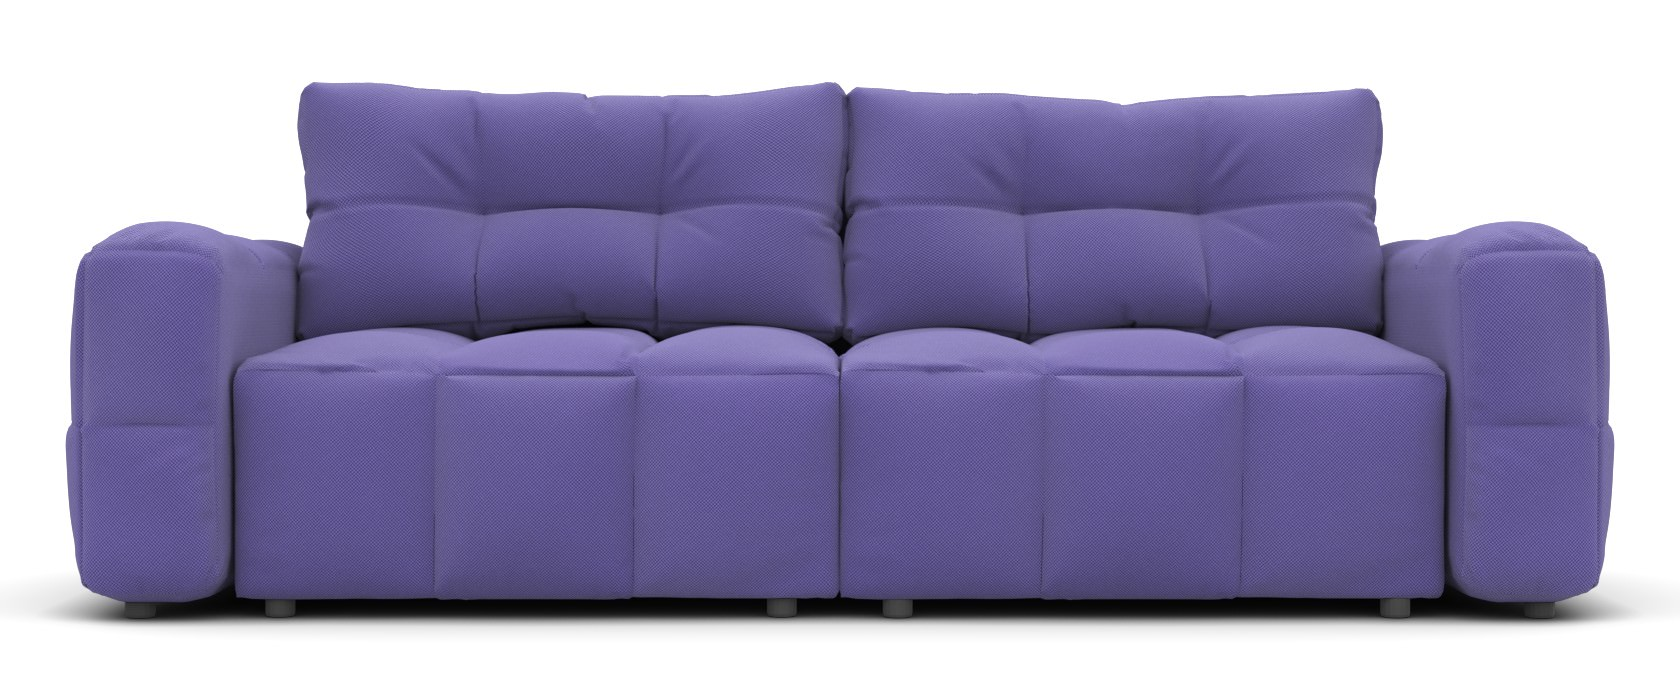 Трехместный диван Leonardo - Pufetto